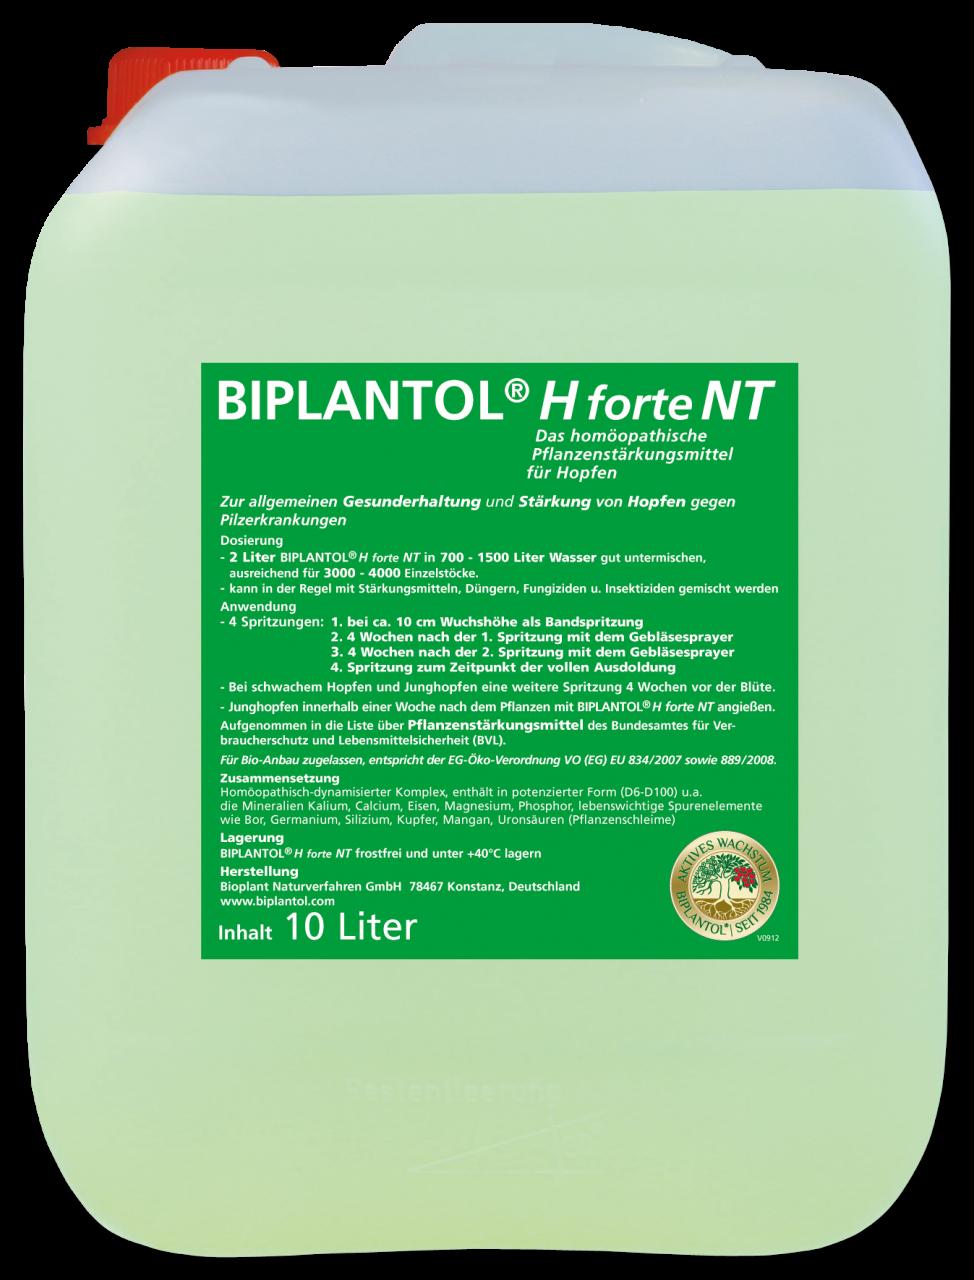 BIPLANTOL® H forte NT